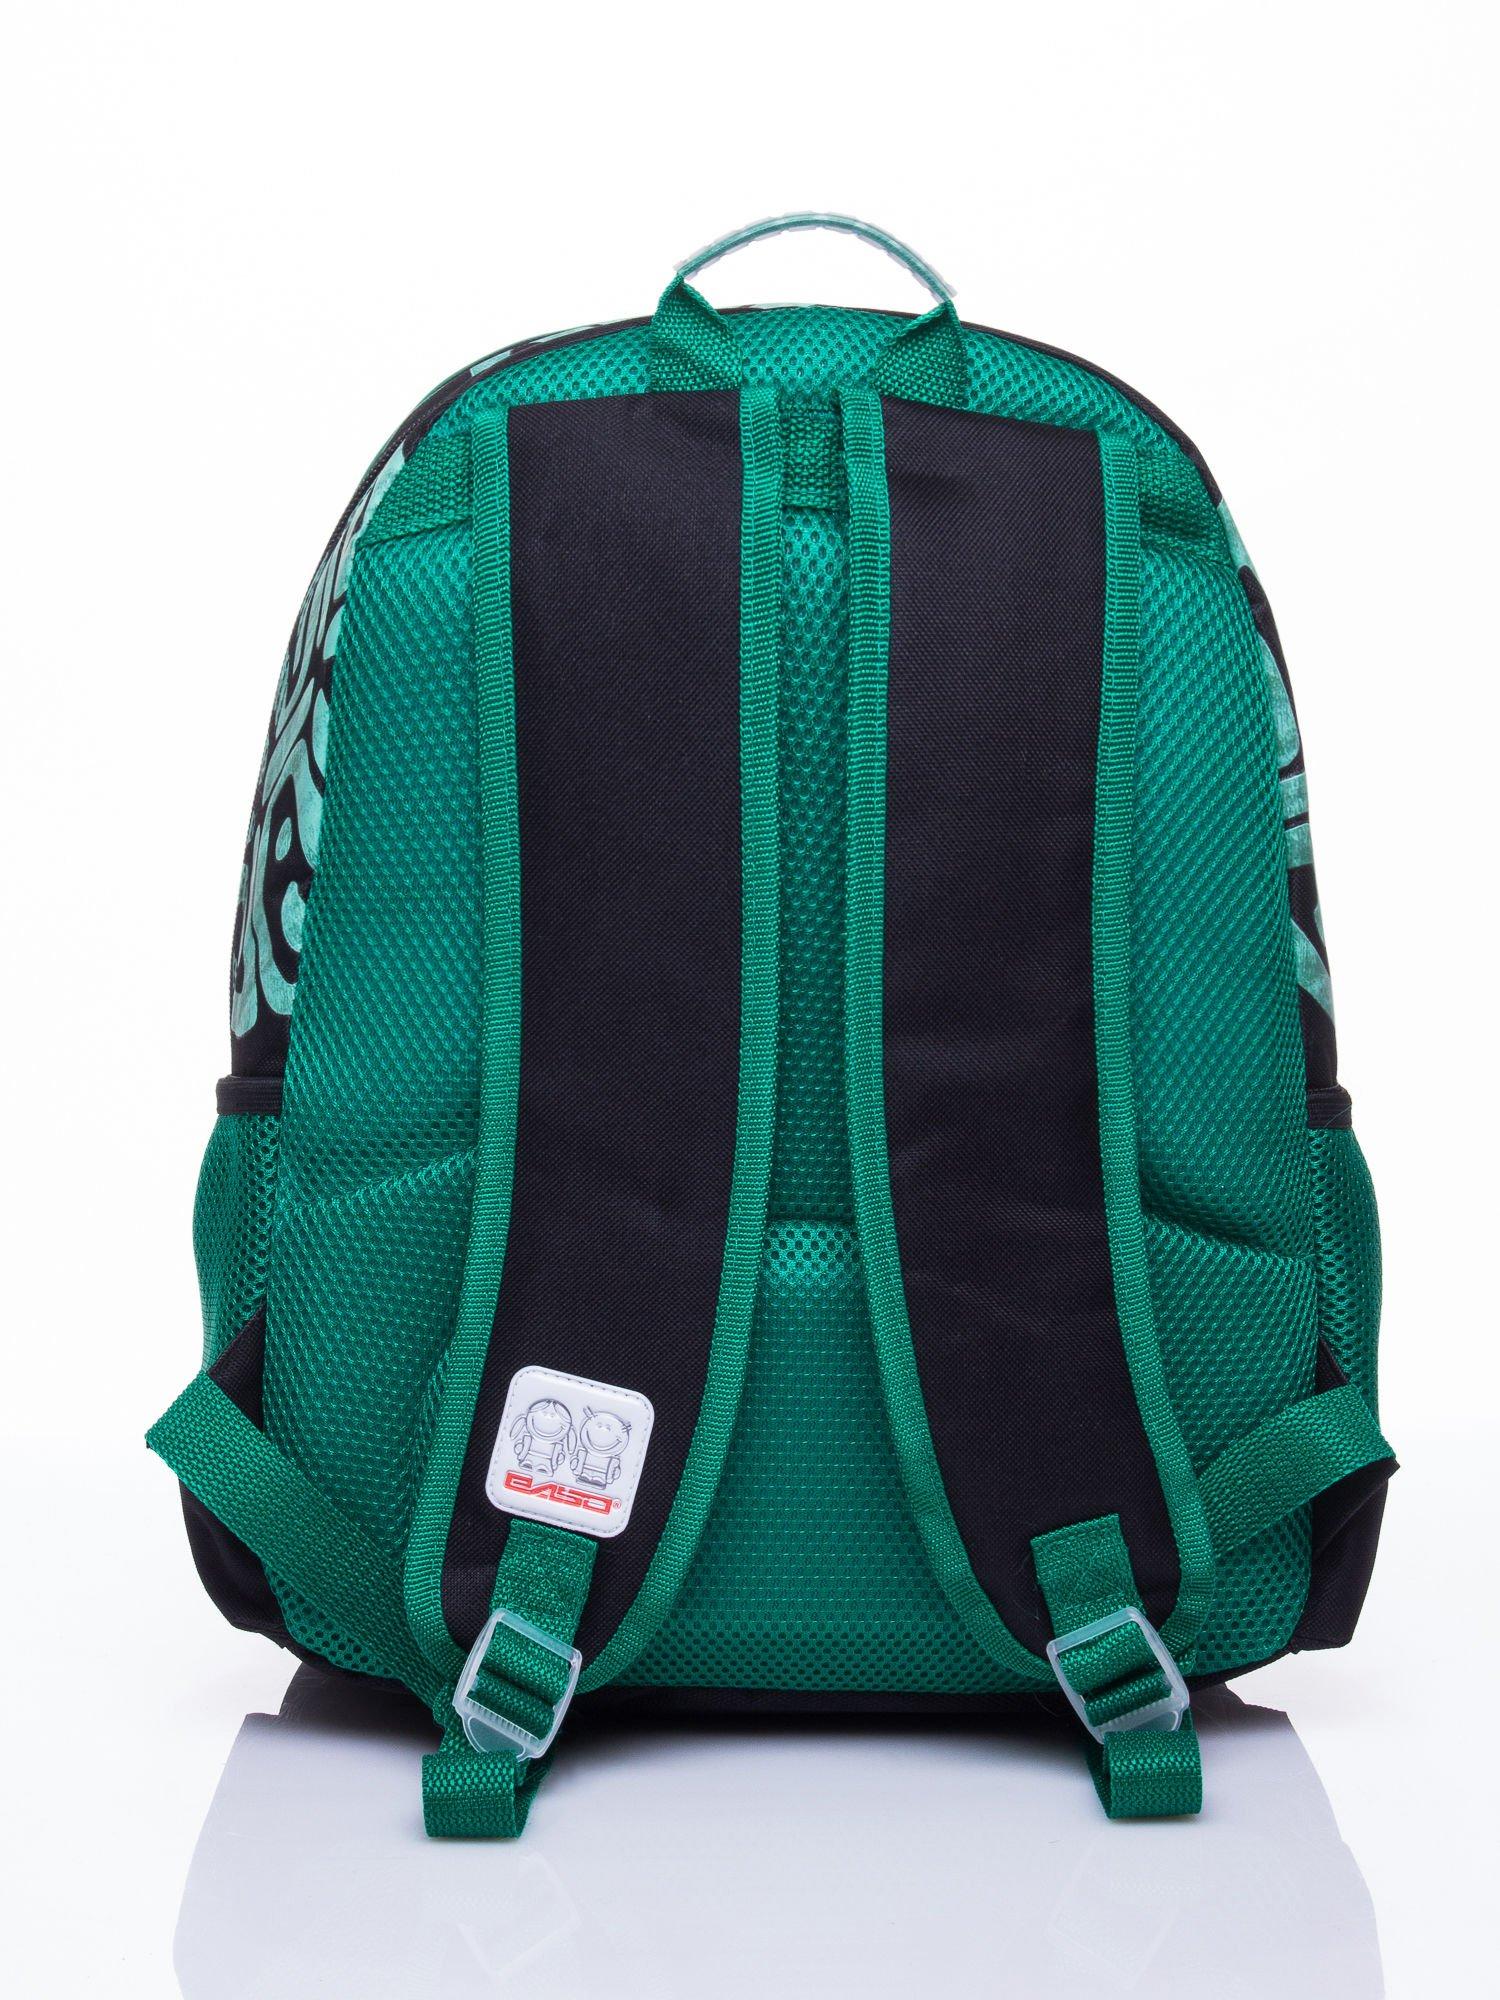 Czarny plecak szkolny DISNEY Kung Fu Panda                                  zdj.                                  3